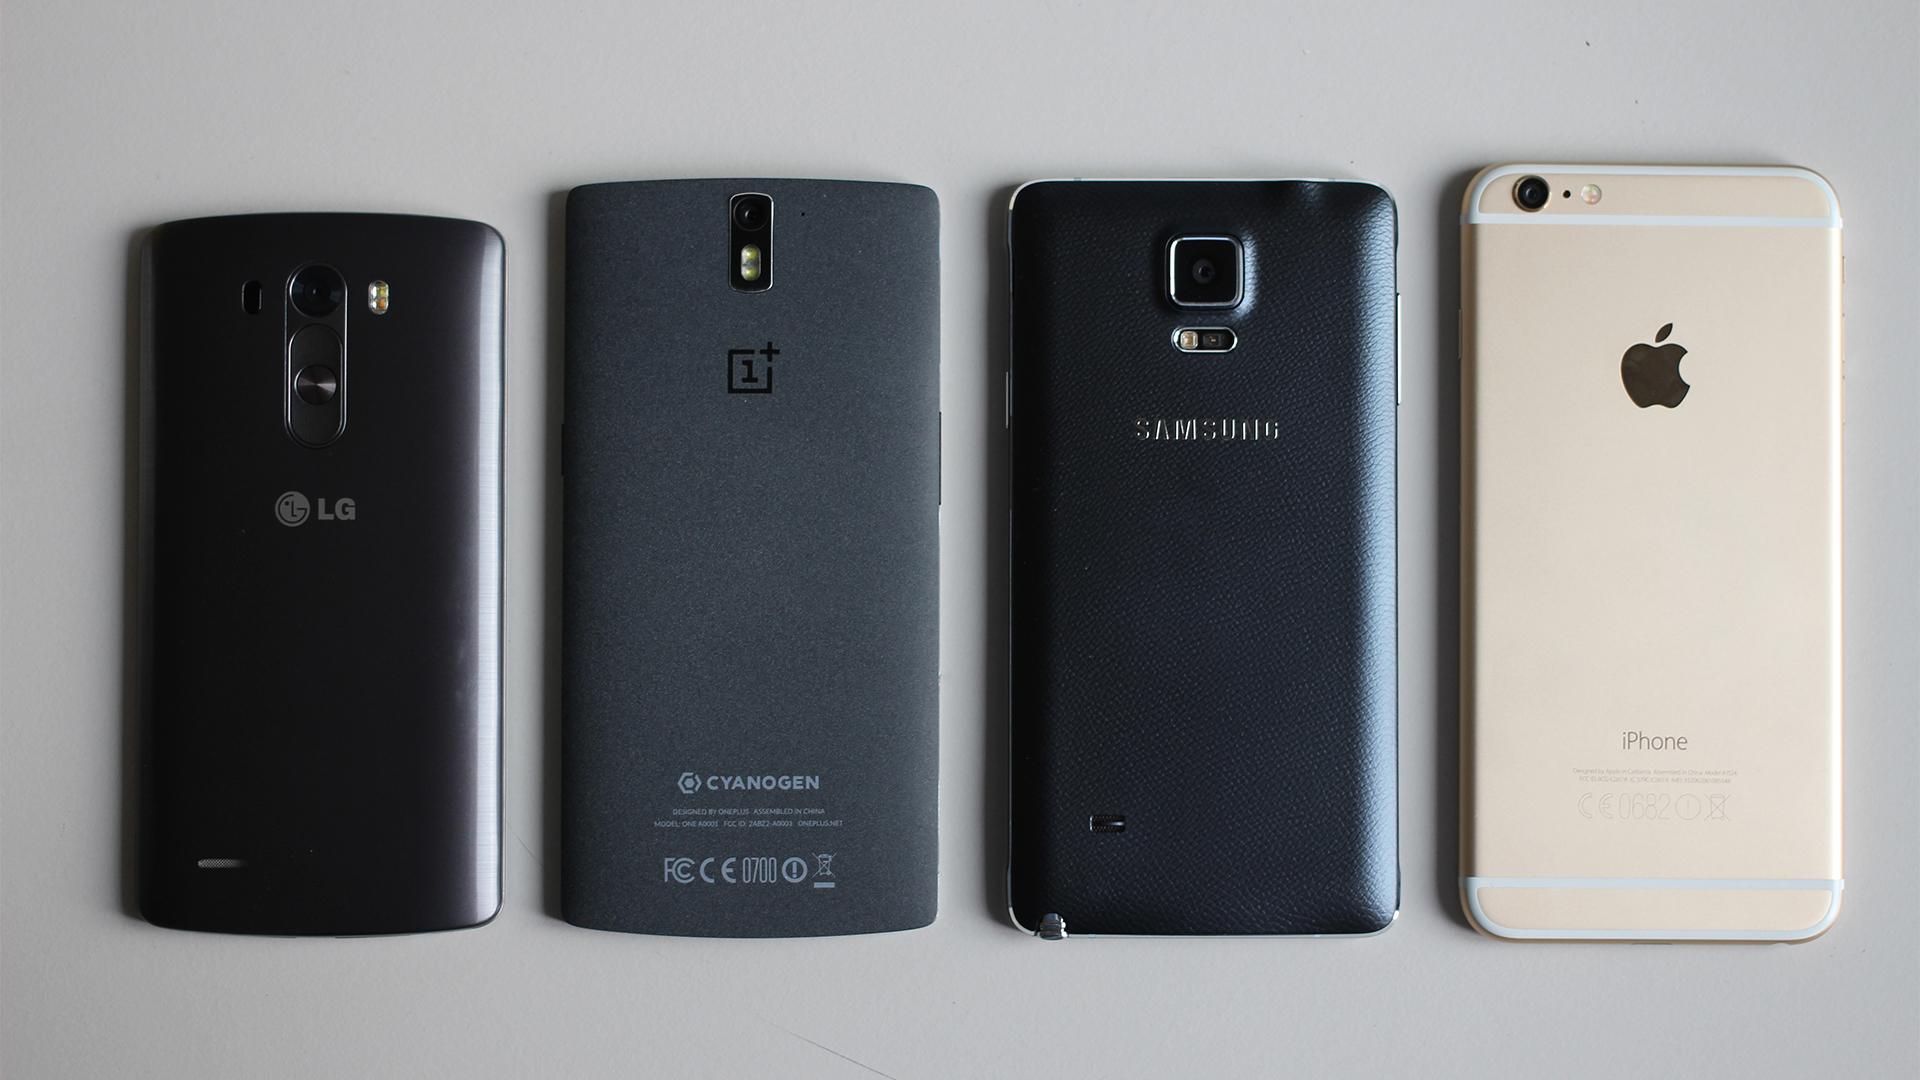 Smartphones sales overtake feature phone shipments